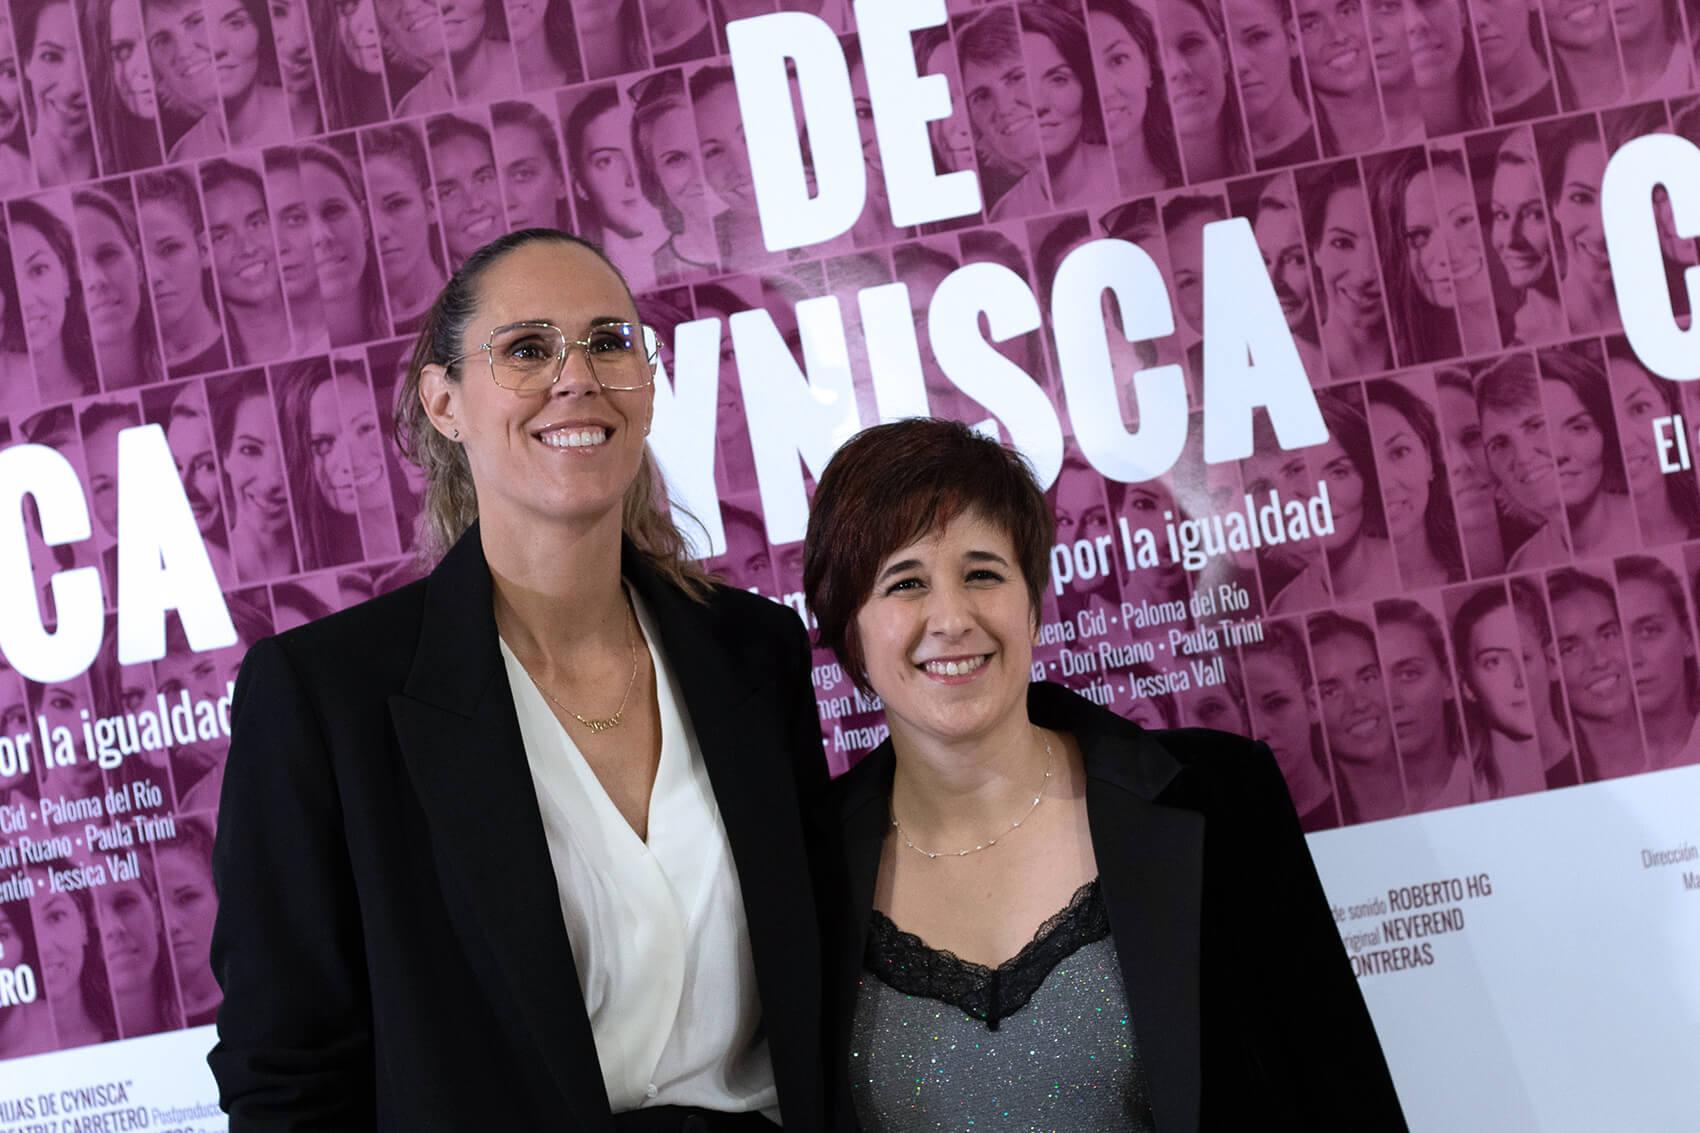 Amaya Valdemoro y Beatriz Carretero